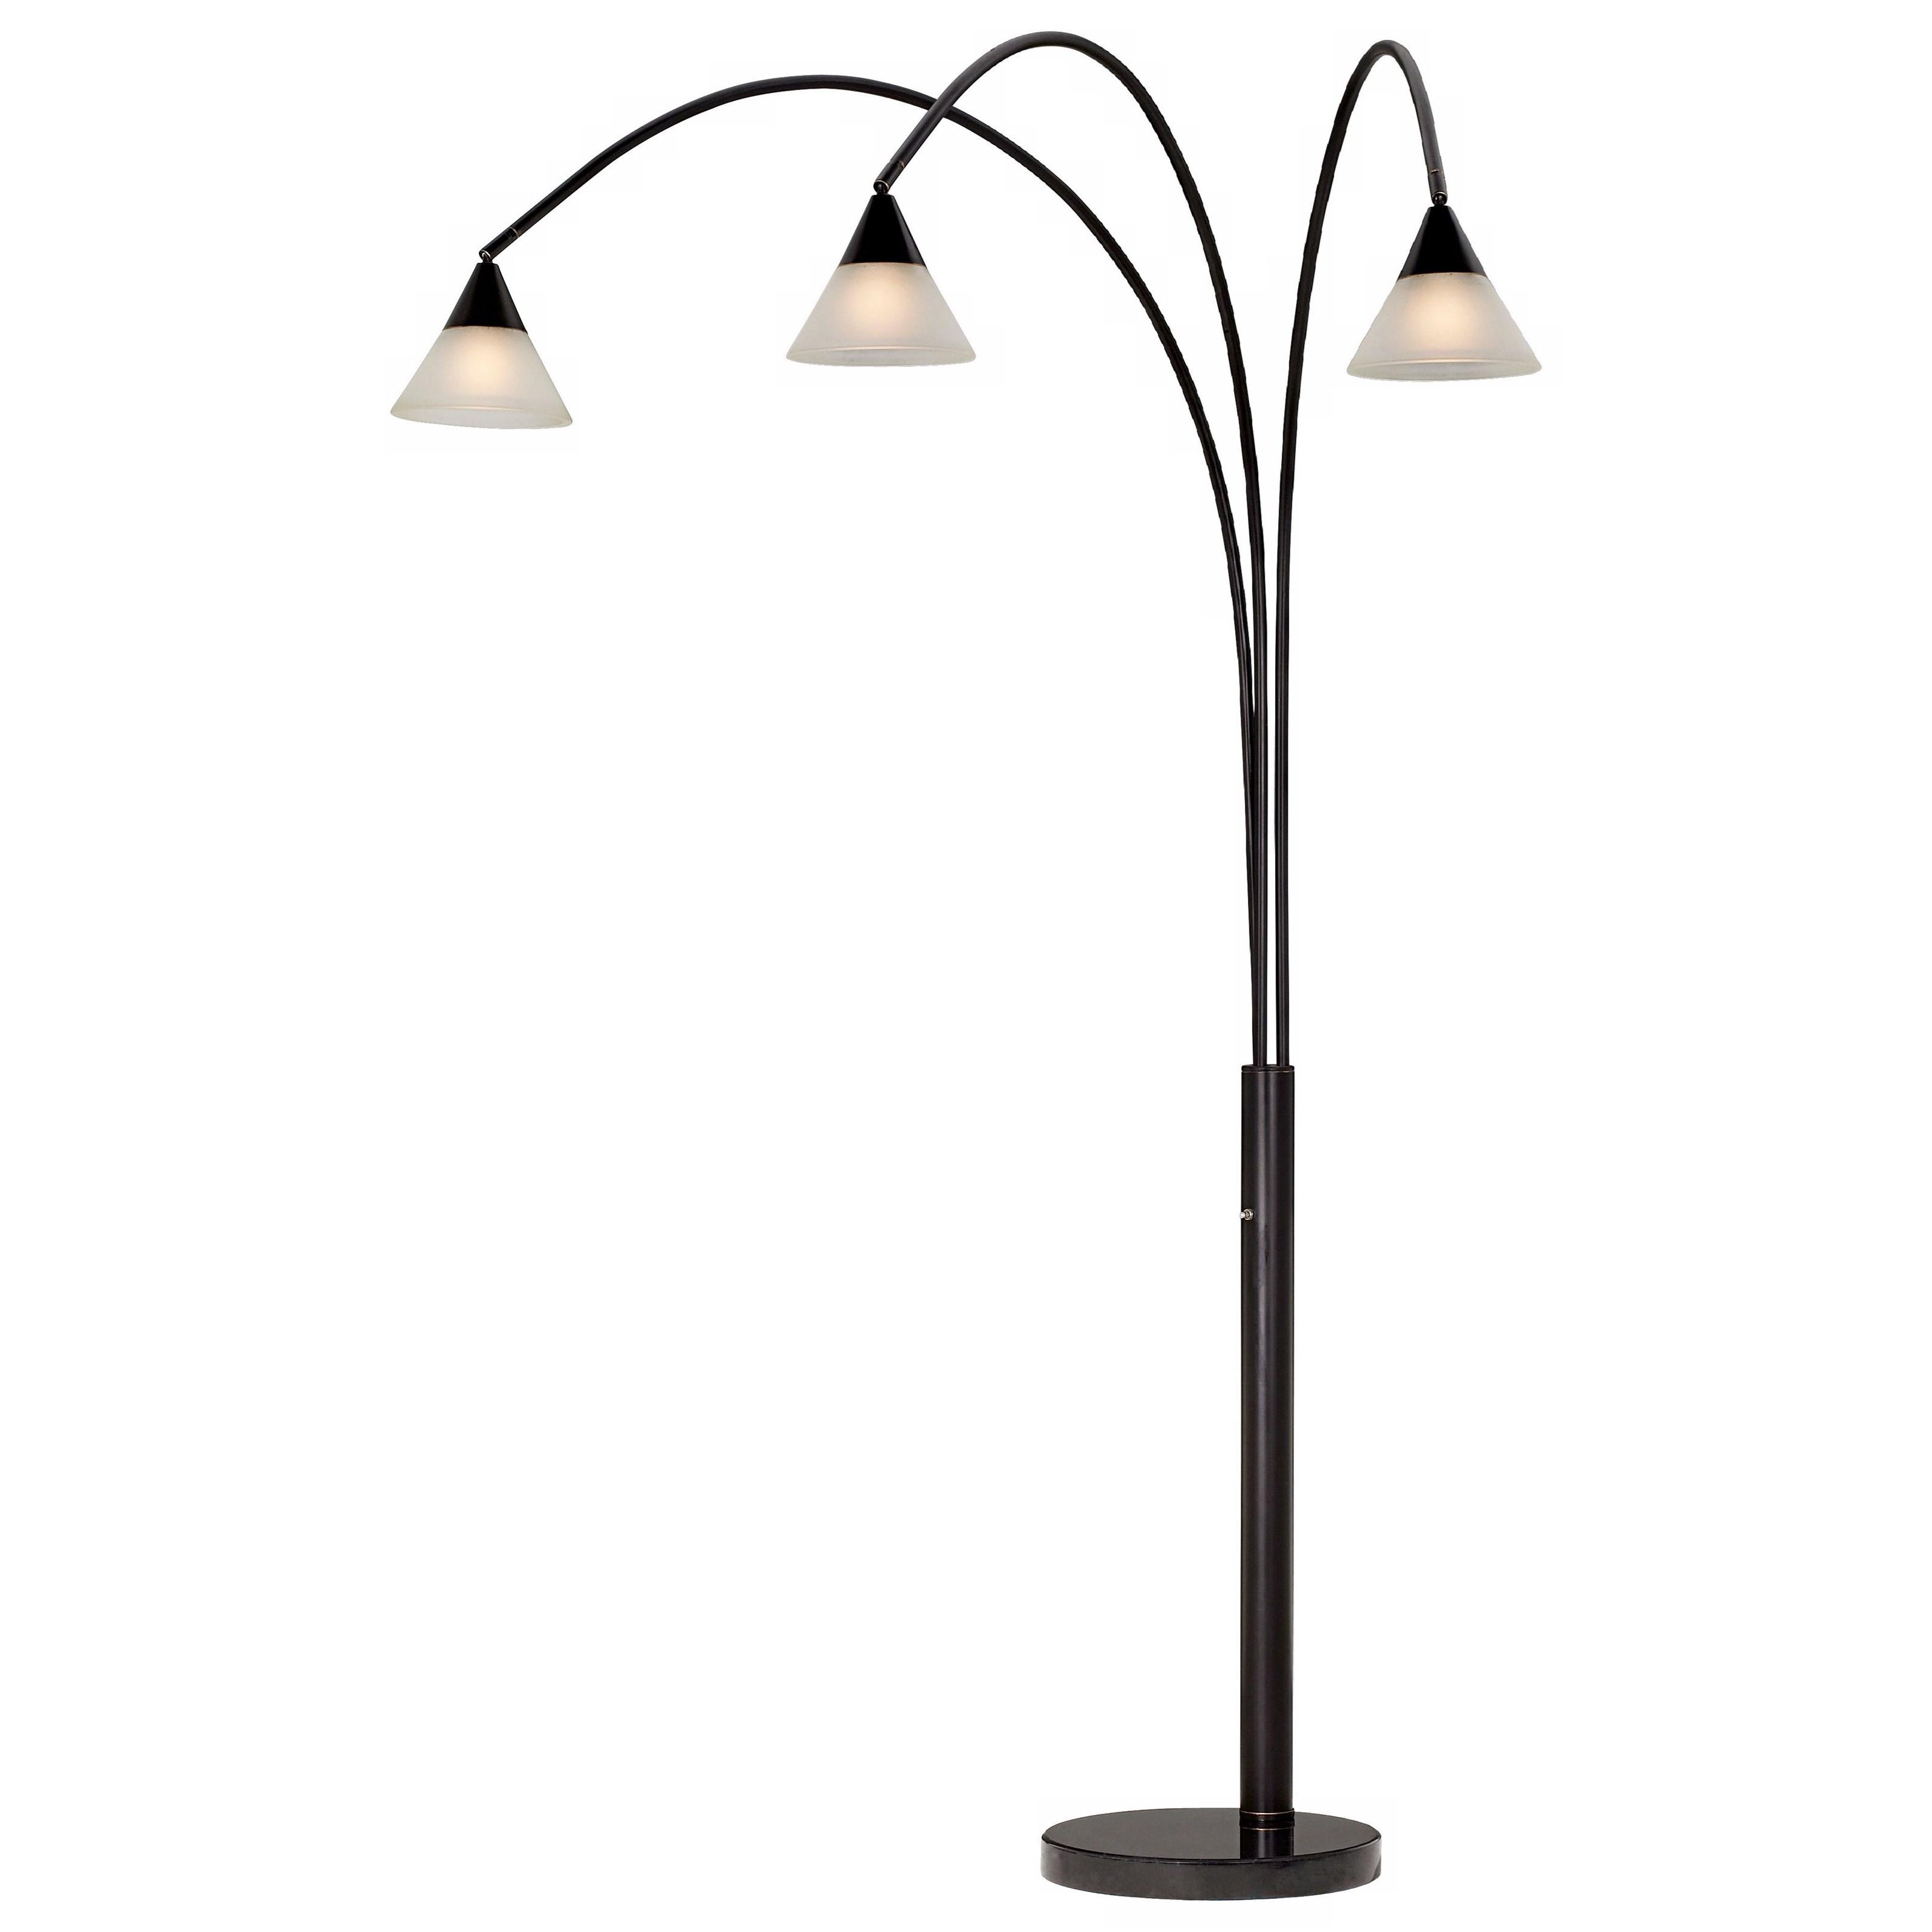 Floor Lamps Archway Lamp-Dark Bronze at Bennett's Furniture and Mattresses